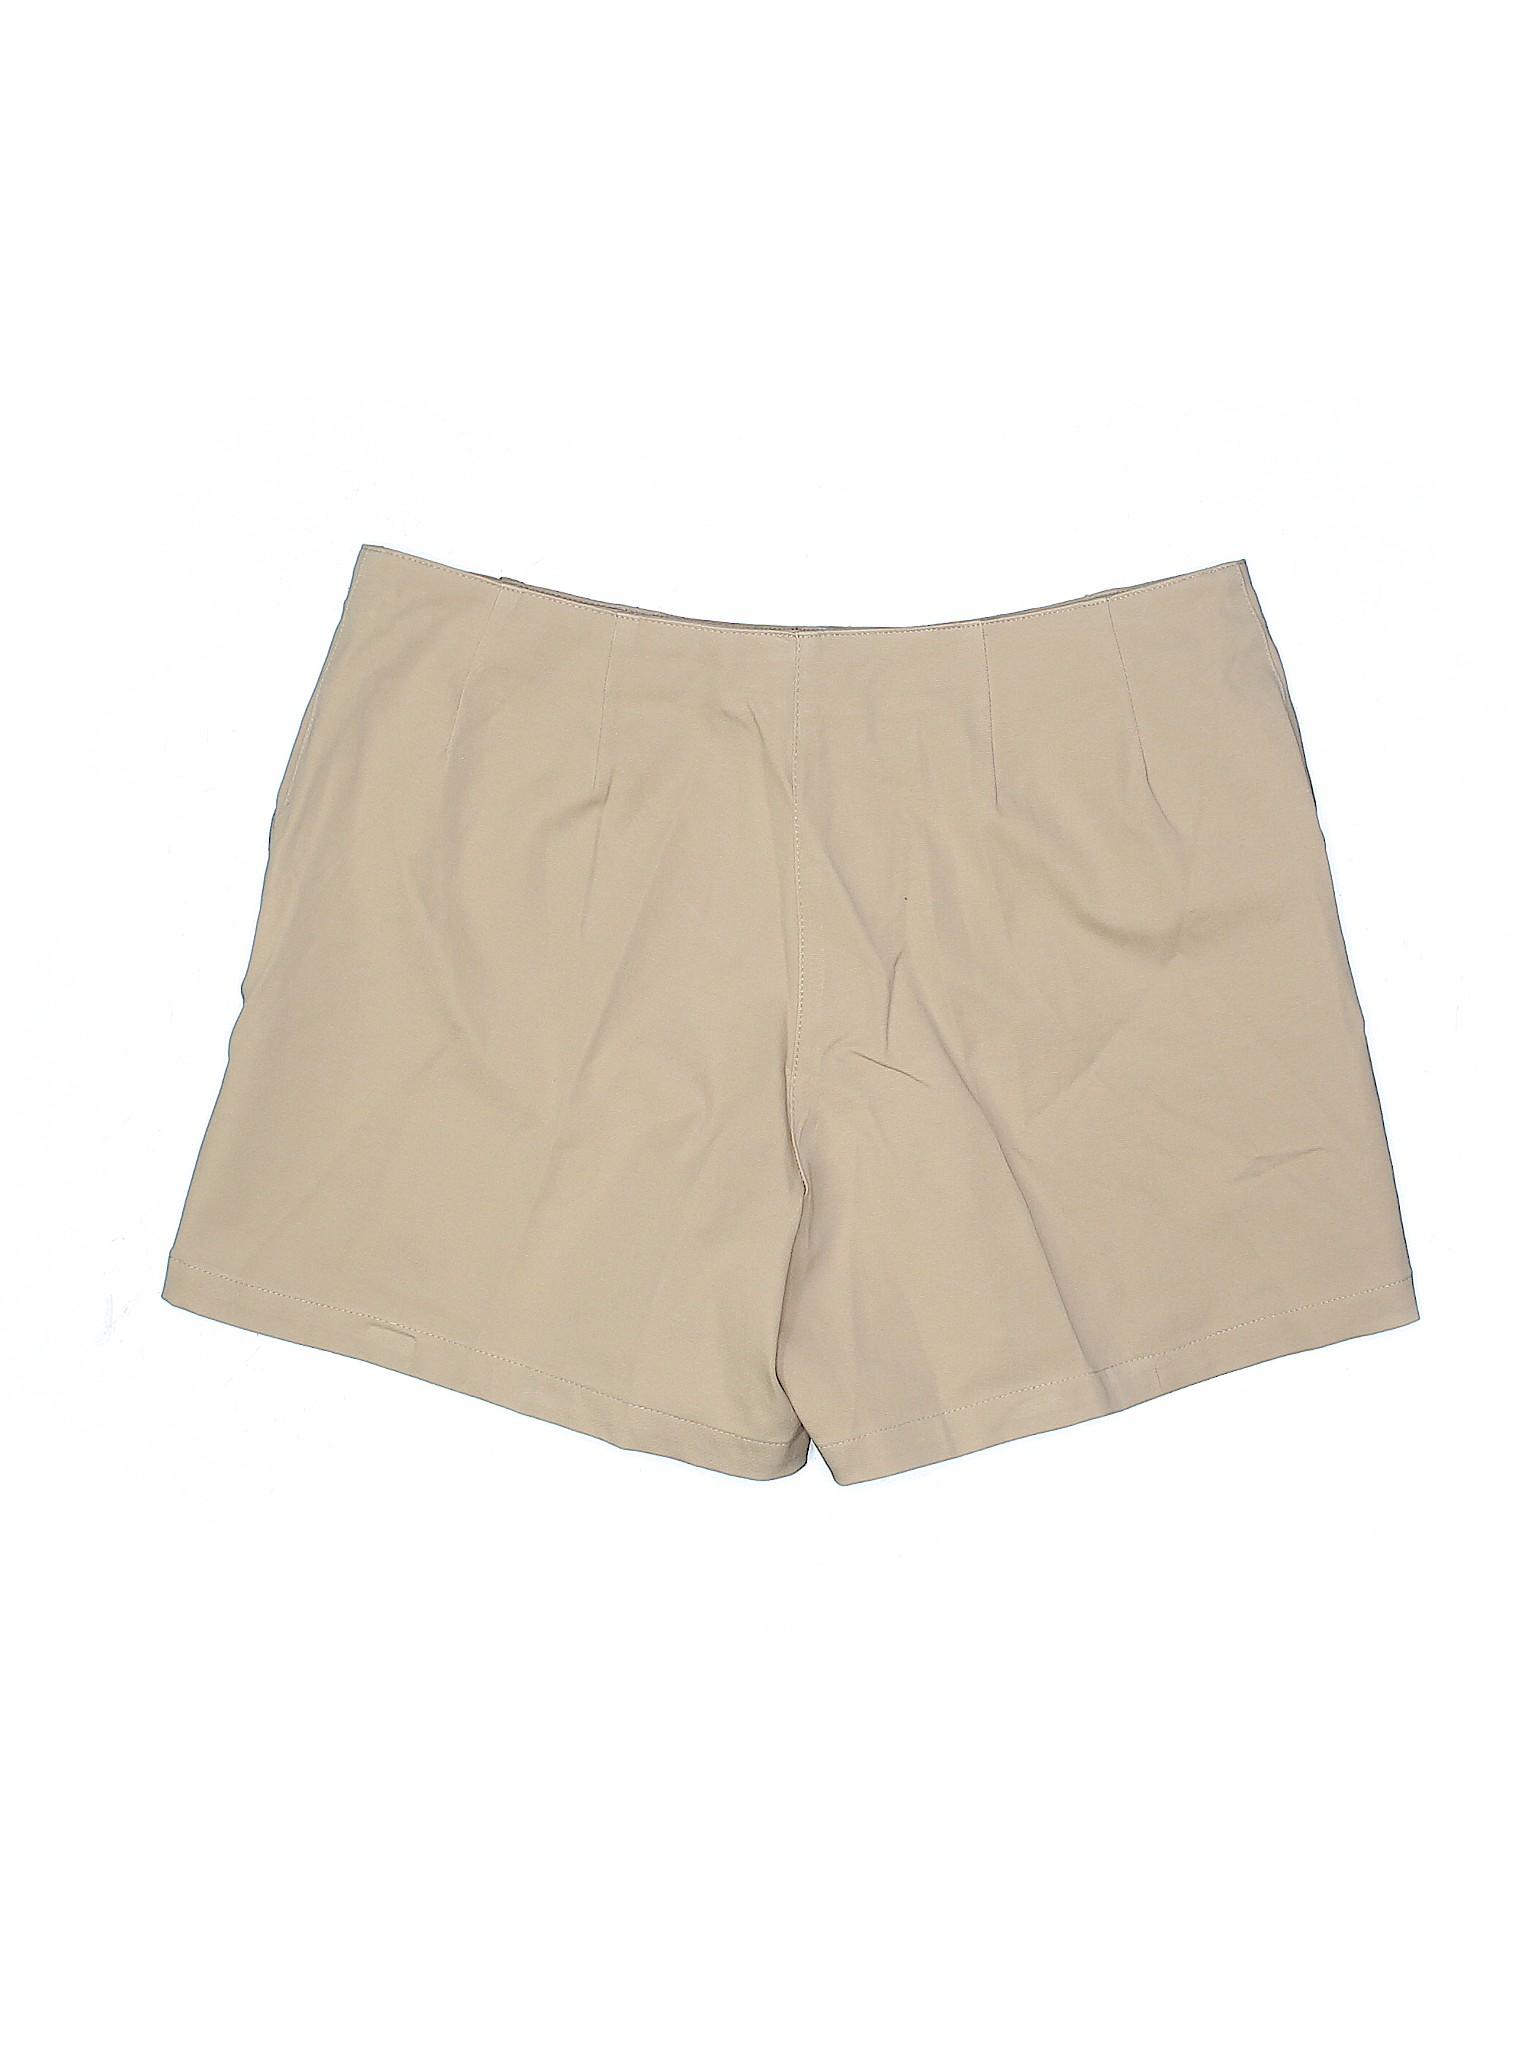 Shorts Boston Boutique Boutique Proper Boston qYPHzn